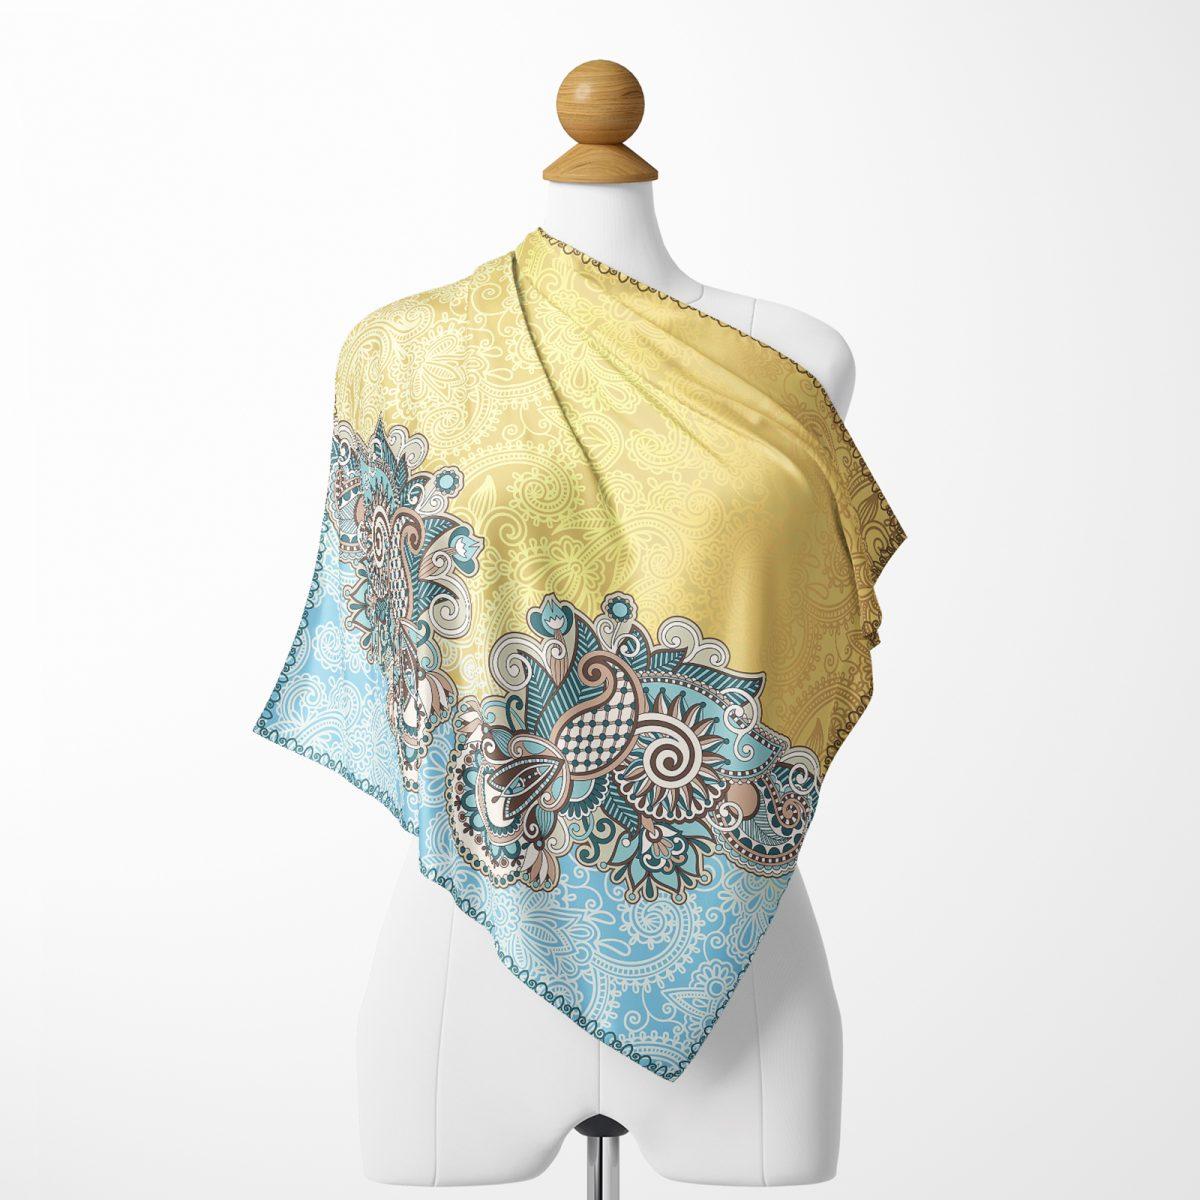 Realhomes Gold ve mavi ahengi Dijital Baskılı Modern Tivil Eşarp Realhomes